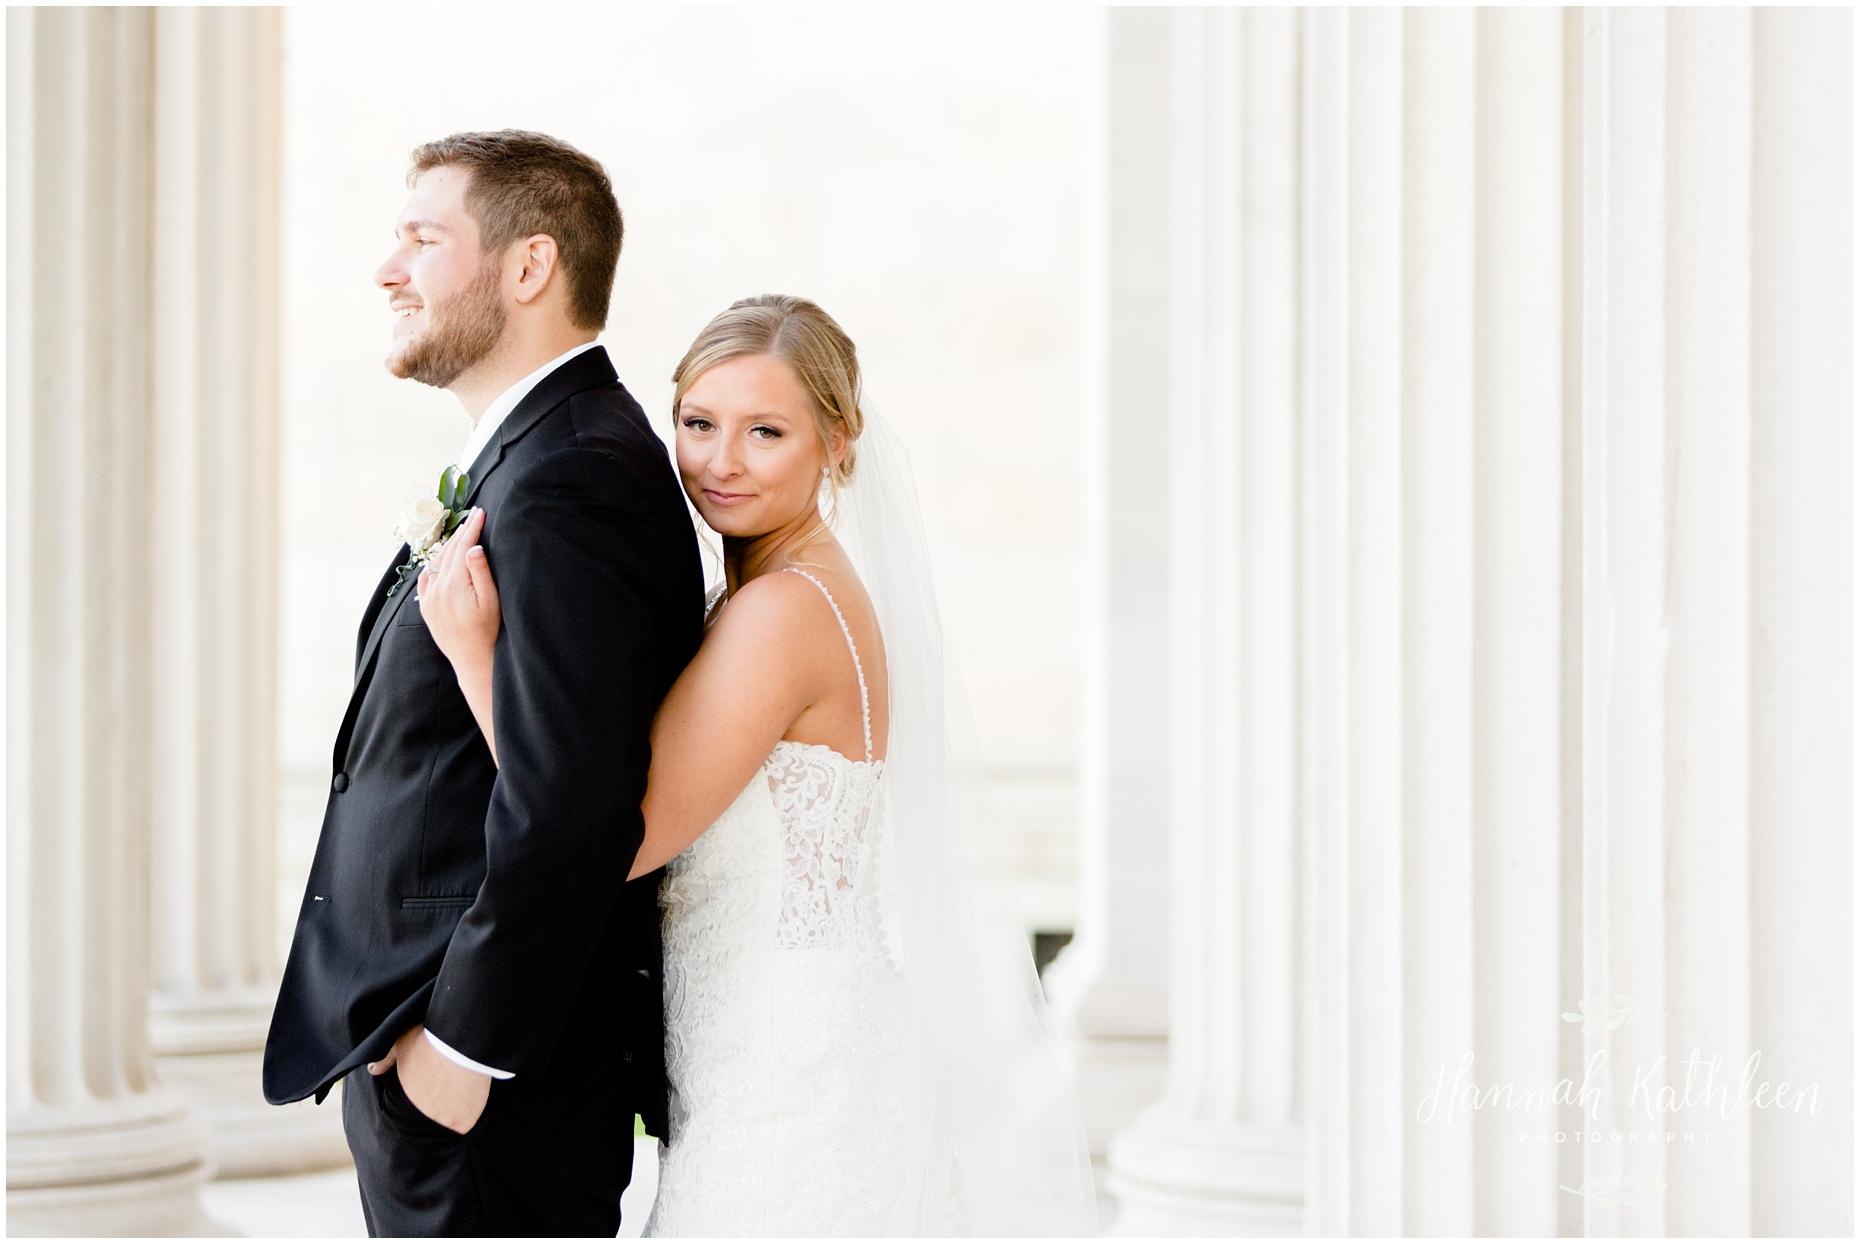 jenn_alex_fall_buffalo_wedding_koteckis